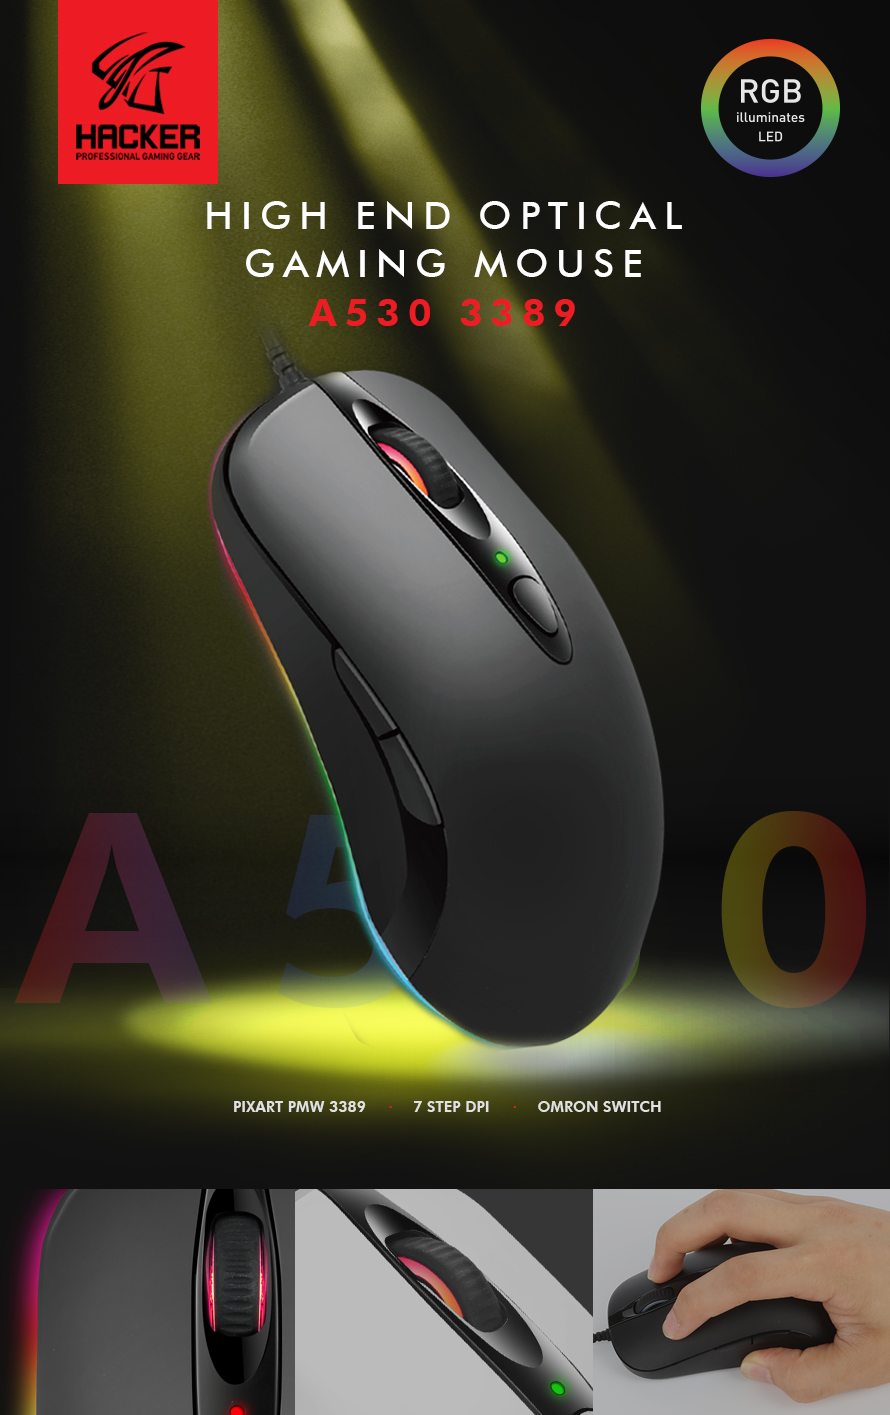 ABKO HACKER A530 3389 RGB 게이밍 마우스(블랙)